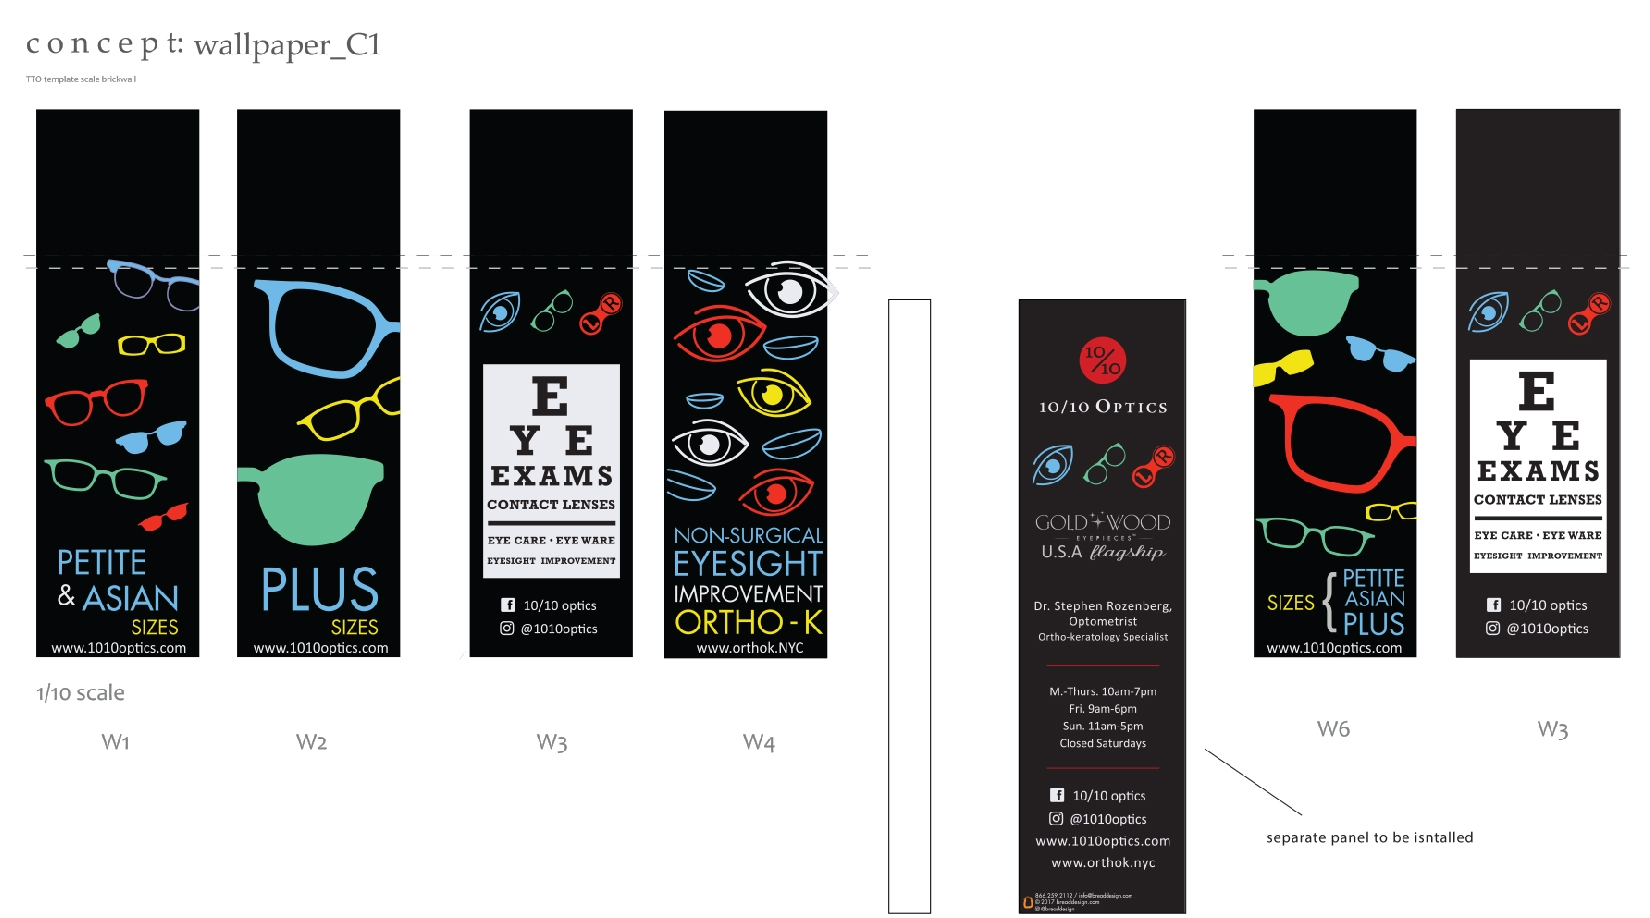 bdg-web_tto-process2.jpg